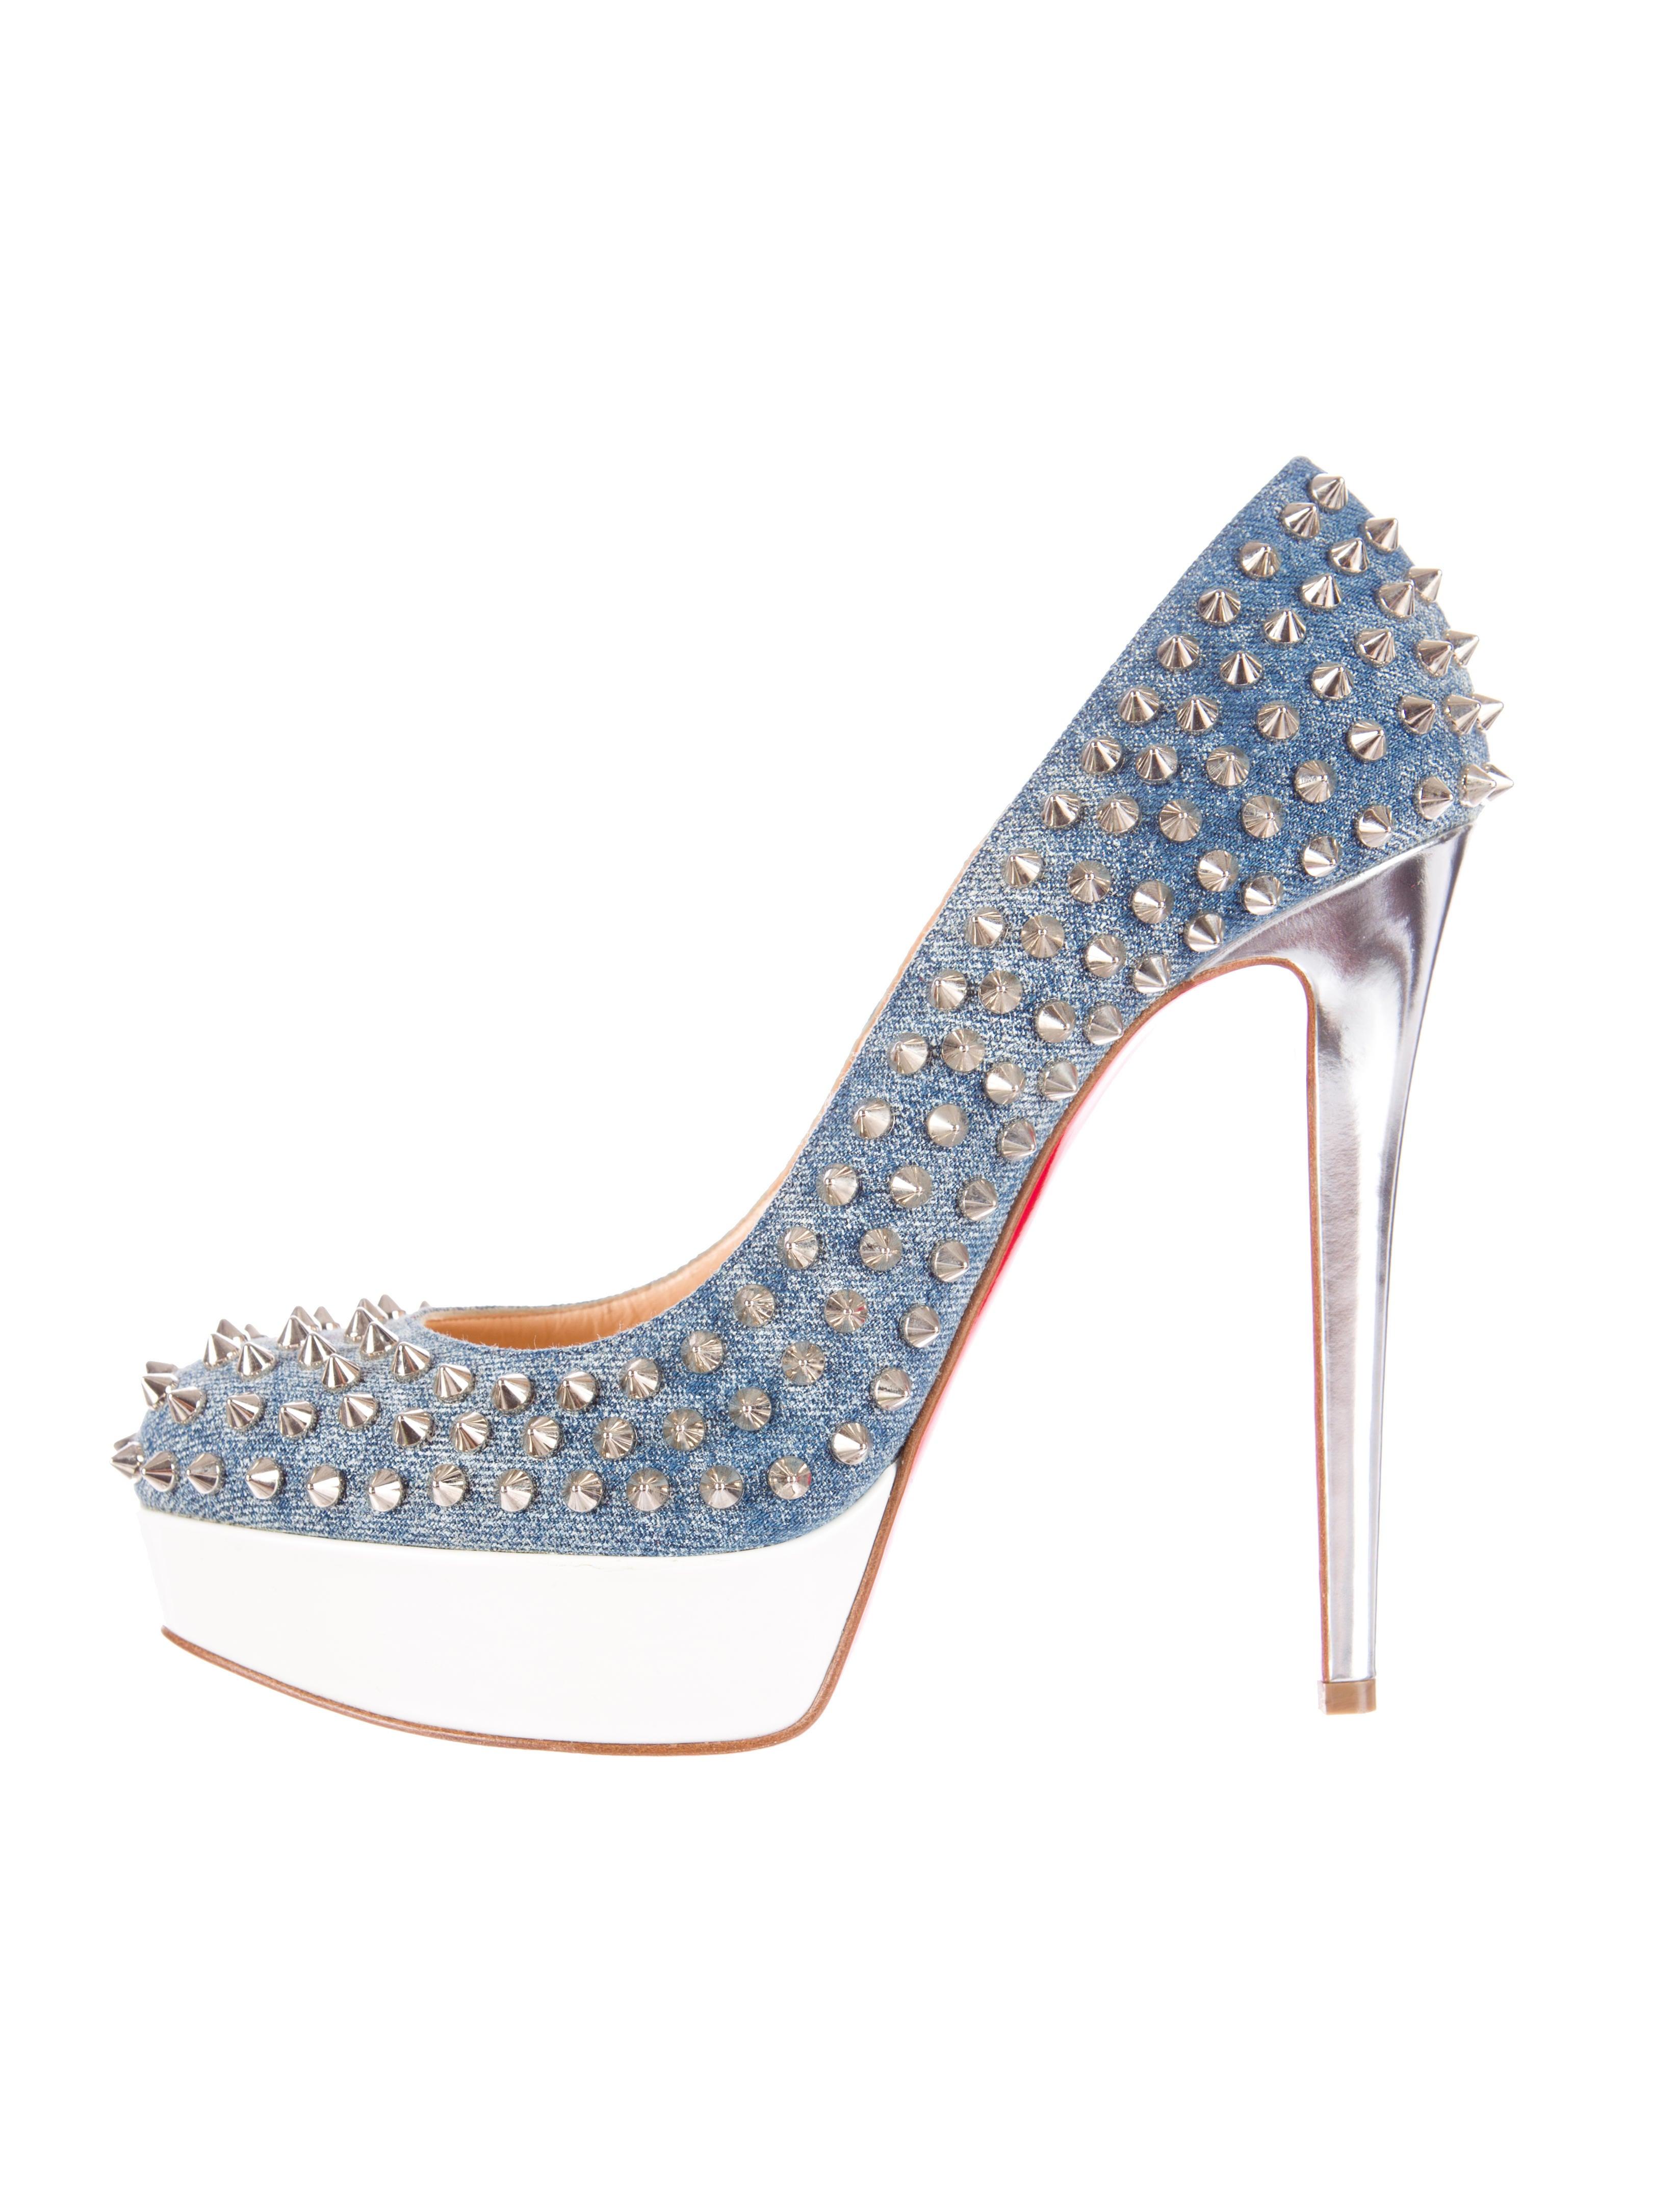 Christian Louboutin Bianca Spiked Denim Pumps - Shoes - CHT32491 ...